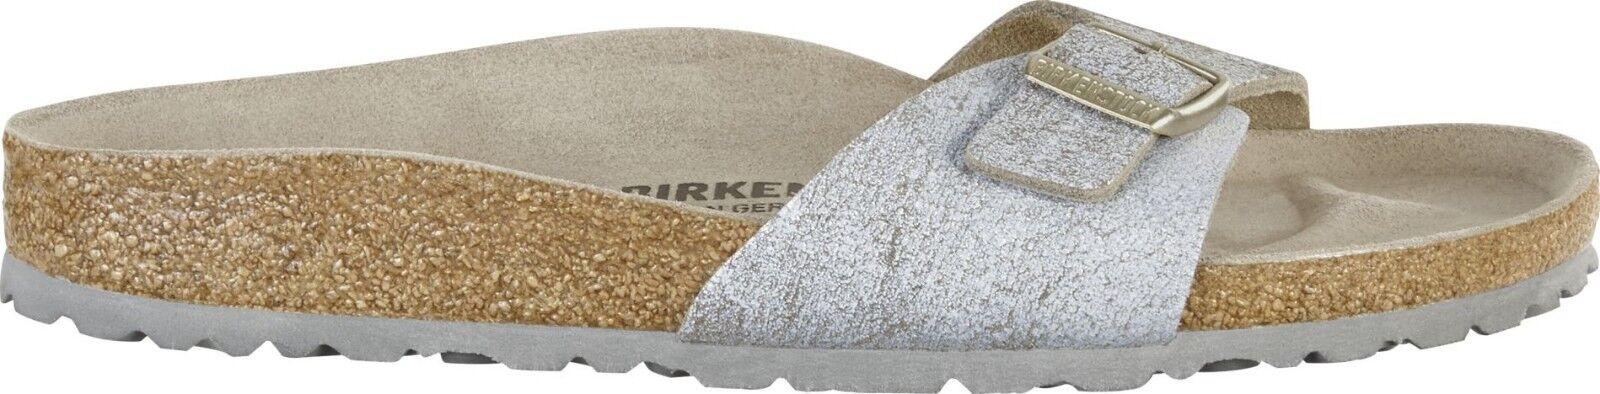 Birkenstock Madrid Washed Metallic Blau schmal Silver Veloursleder 38,42 Fußbett schmal Blau aabf35